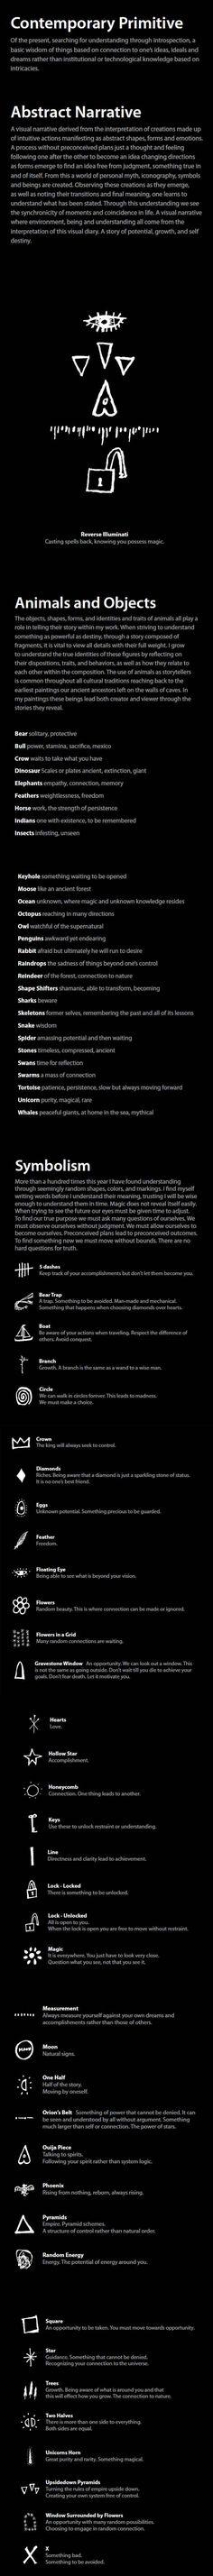 Jesse Reno's symbols meanings (http://jessereno.com/bio.html)